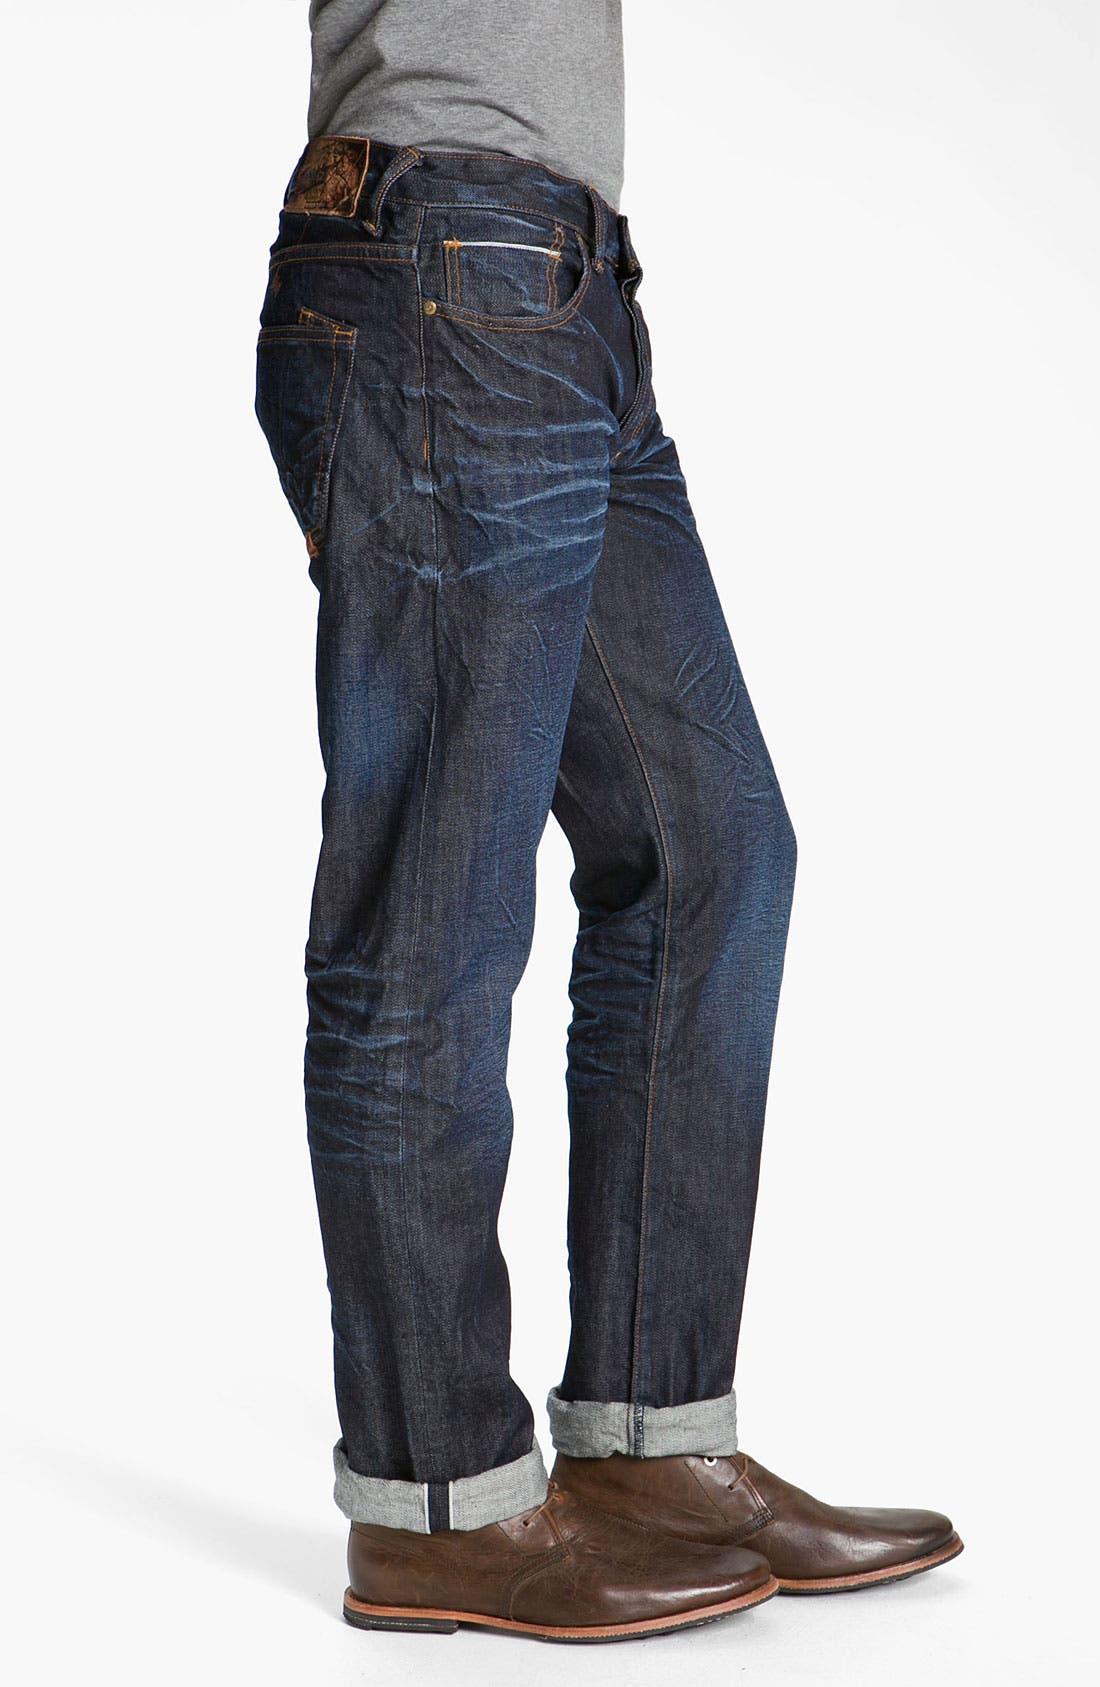 Alternate Image 3  - PRPS 'Snowy Crevasses Barracuda' Straight Leg Jeans (1 Year Wash)